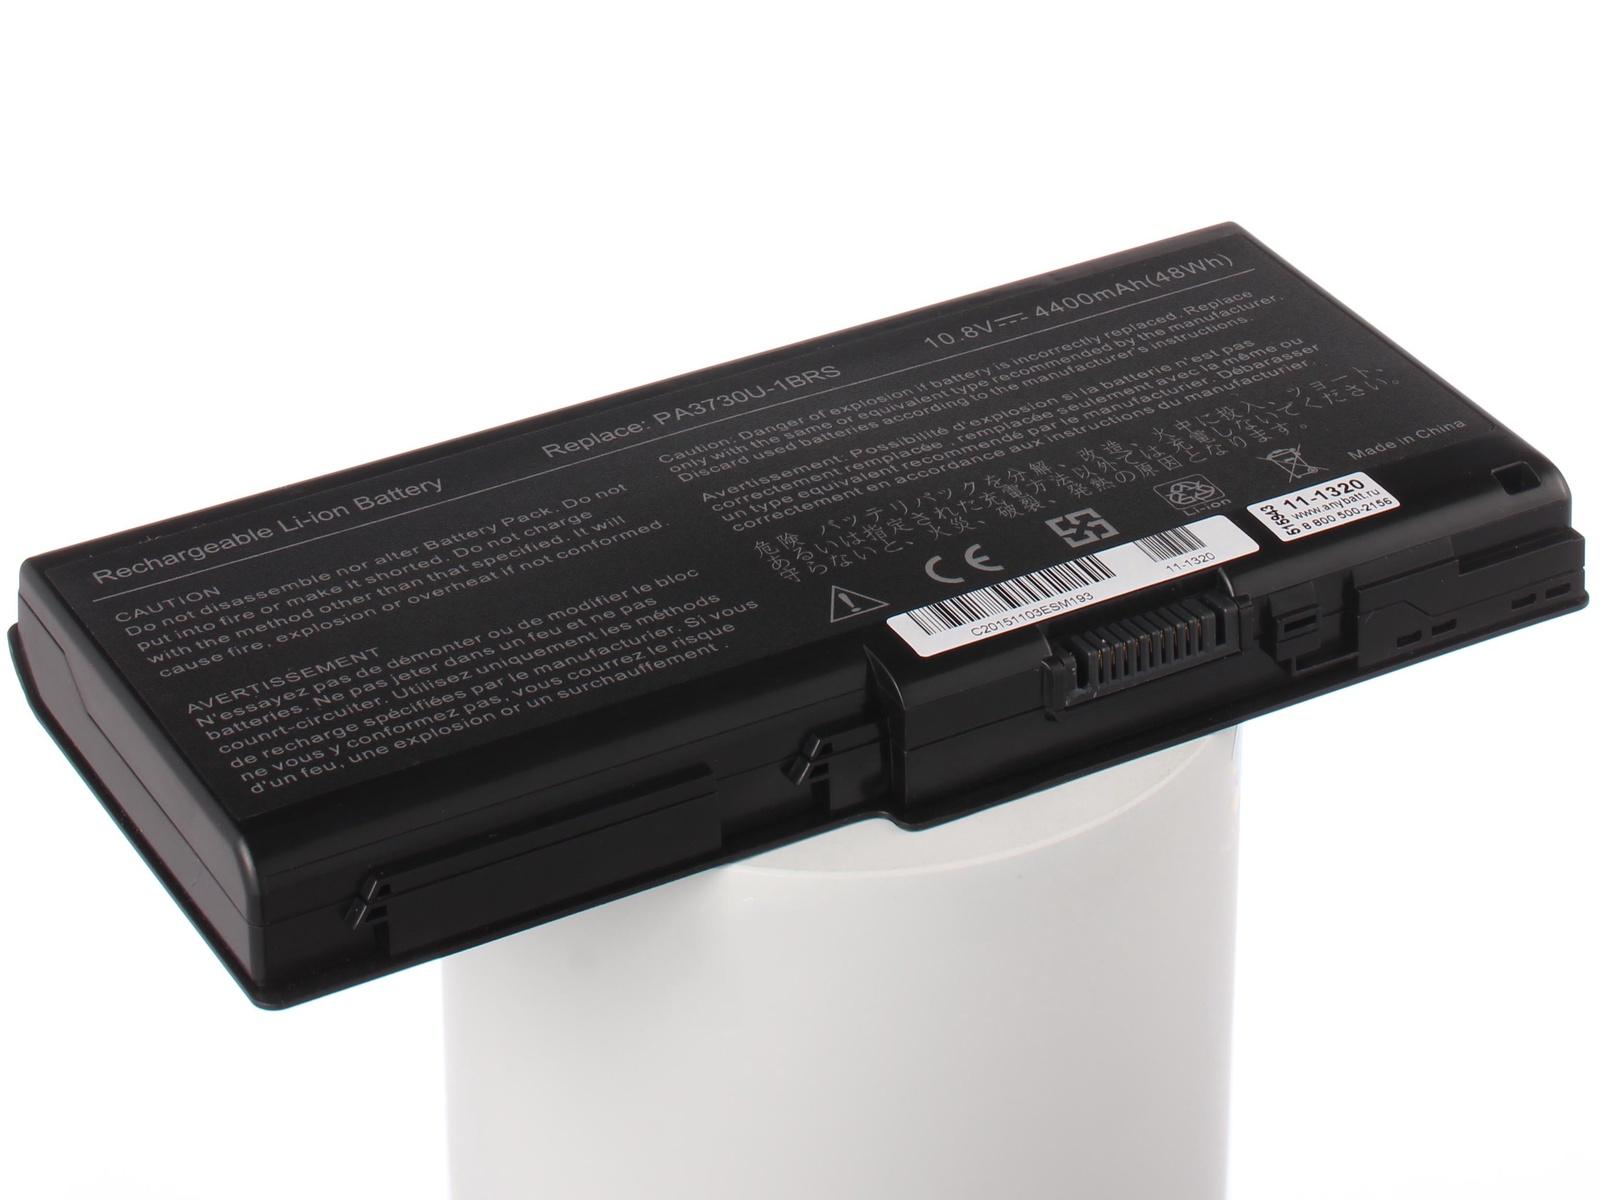 Аккумулятор для ноутбука AnyBatt для ToshiBa Qosmio X500, Qosmio X500-123, Satellite P500, Satellite P500-1EJ, Qosmio X500-12Z, Qosmio X500-158, Qosmio X500-130, Satellite P505-S8980, Qosmio X500-162, Qosmio X505-Q880 цена